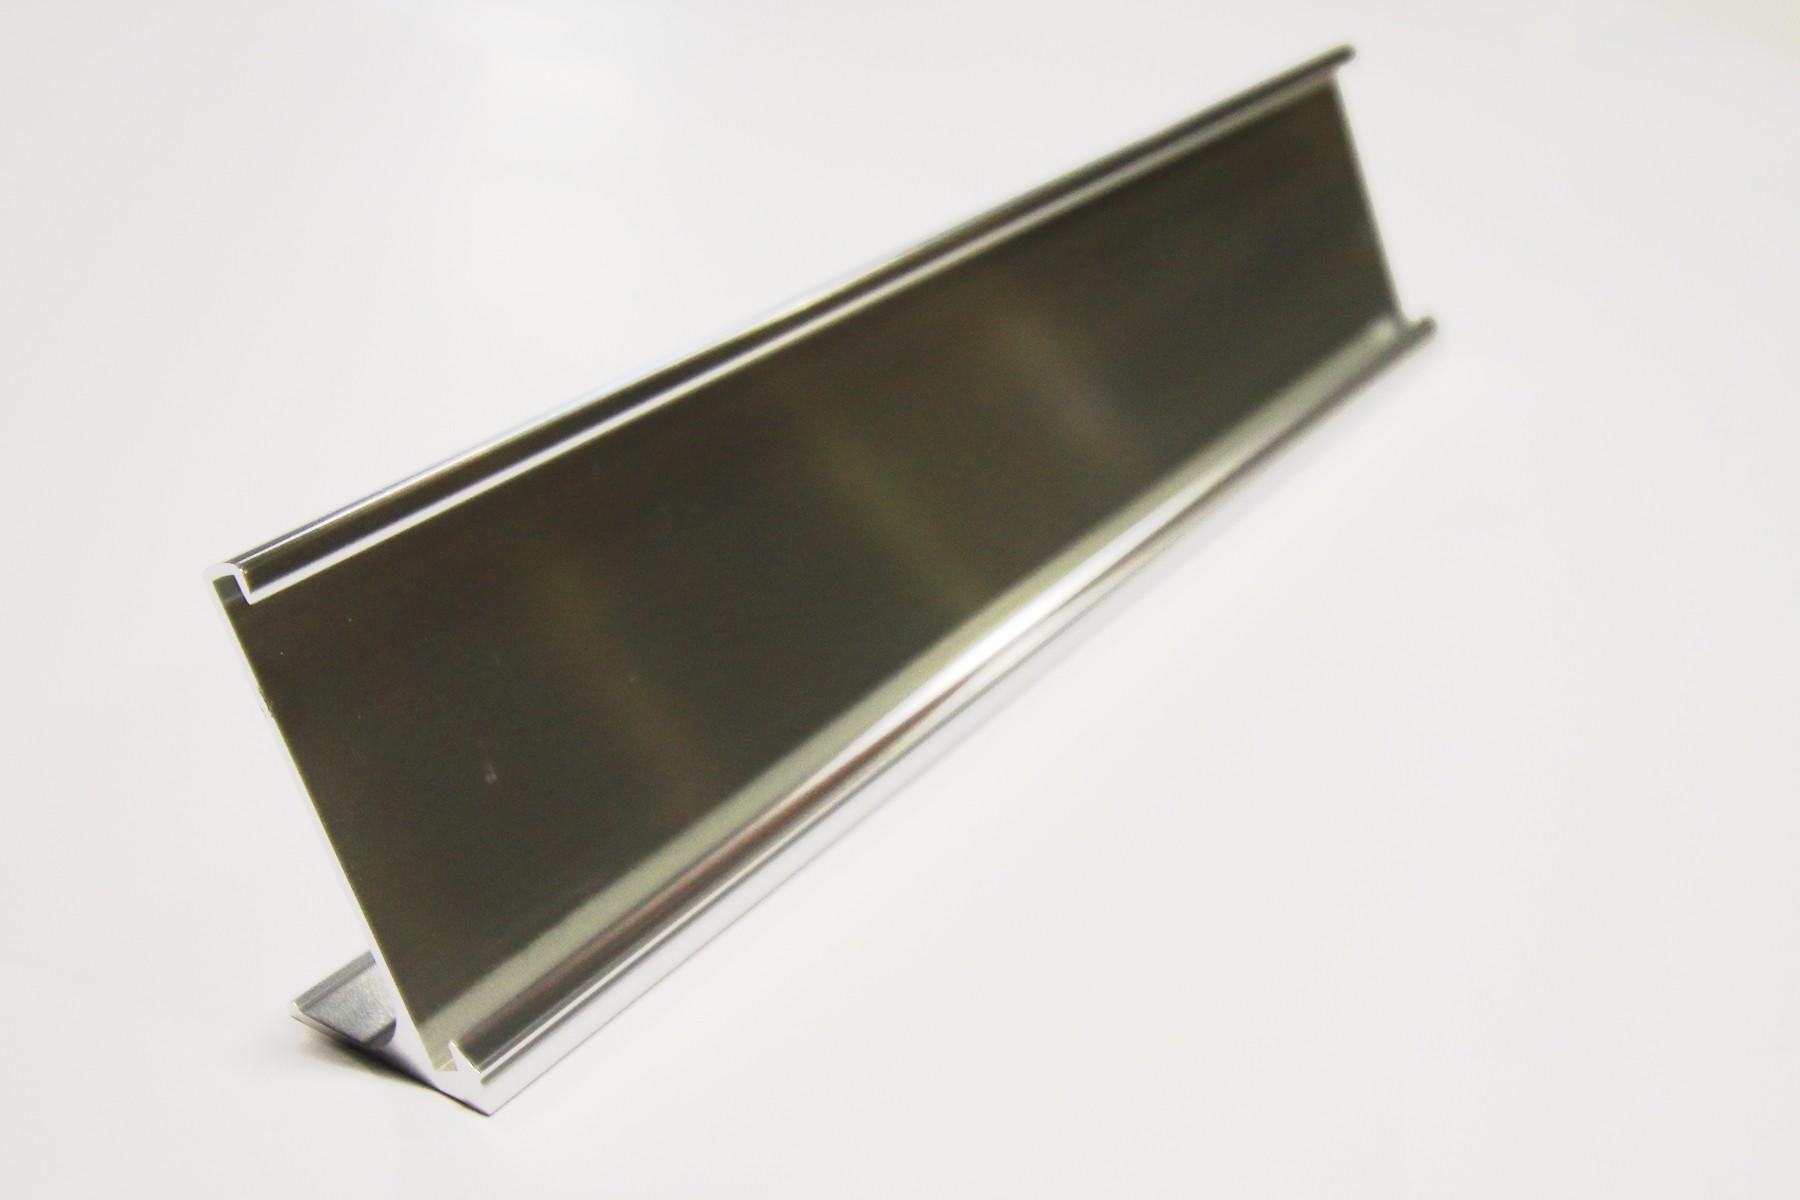 2 x 10 (1/8), Desk Holder, Silver